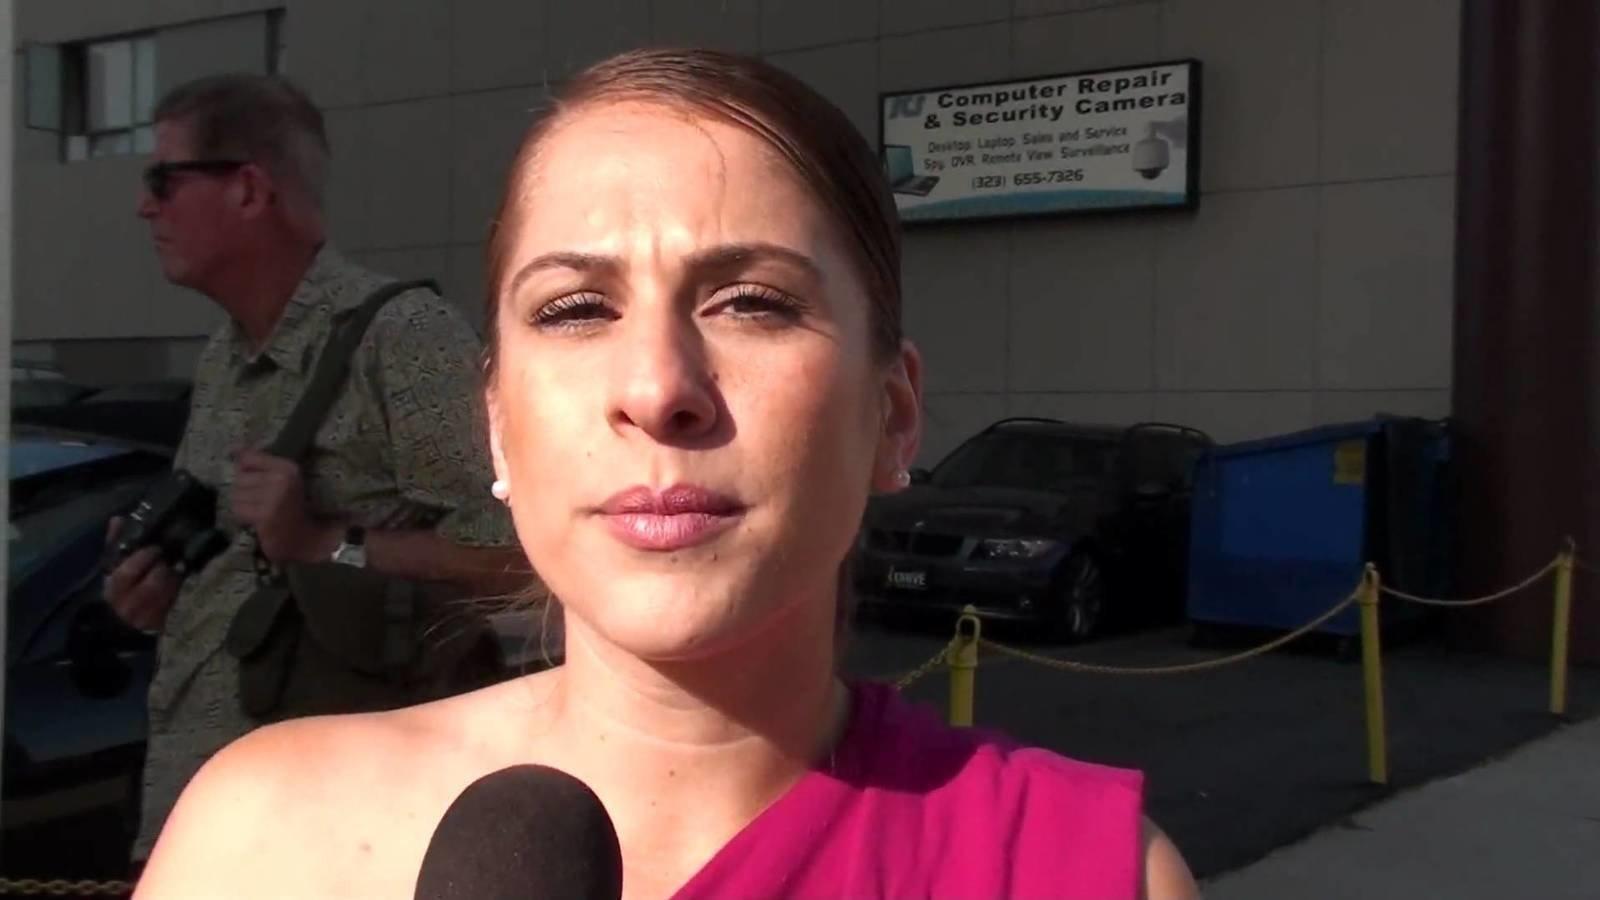 Ana Kasparian Nose Job petition · kick ana kasparian off of tyt · change